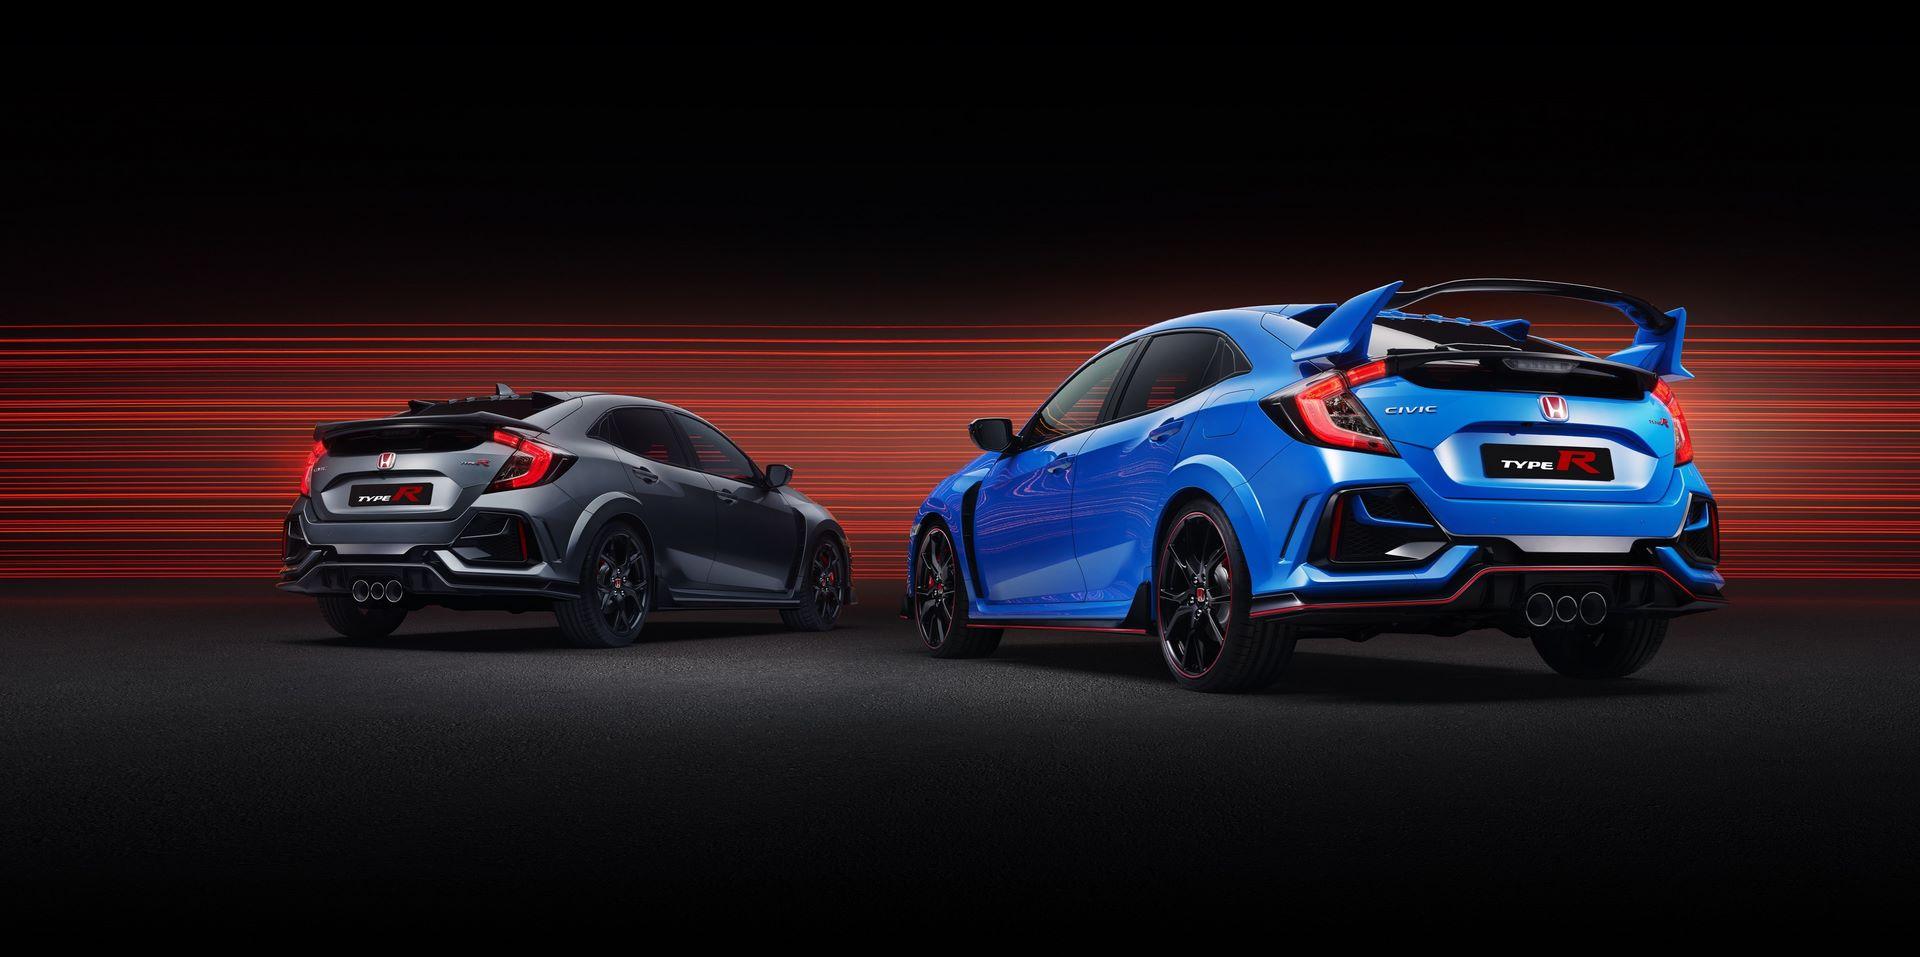 2020 Civic Type R Range - Type R Sport Line & Type R GT